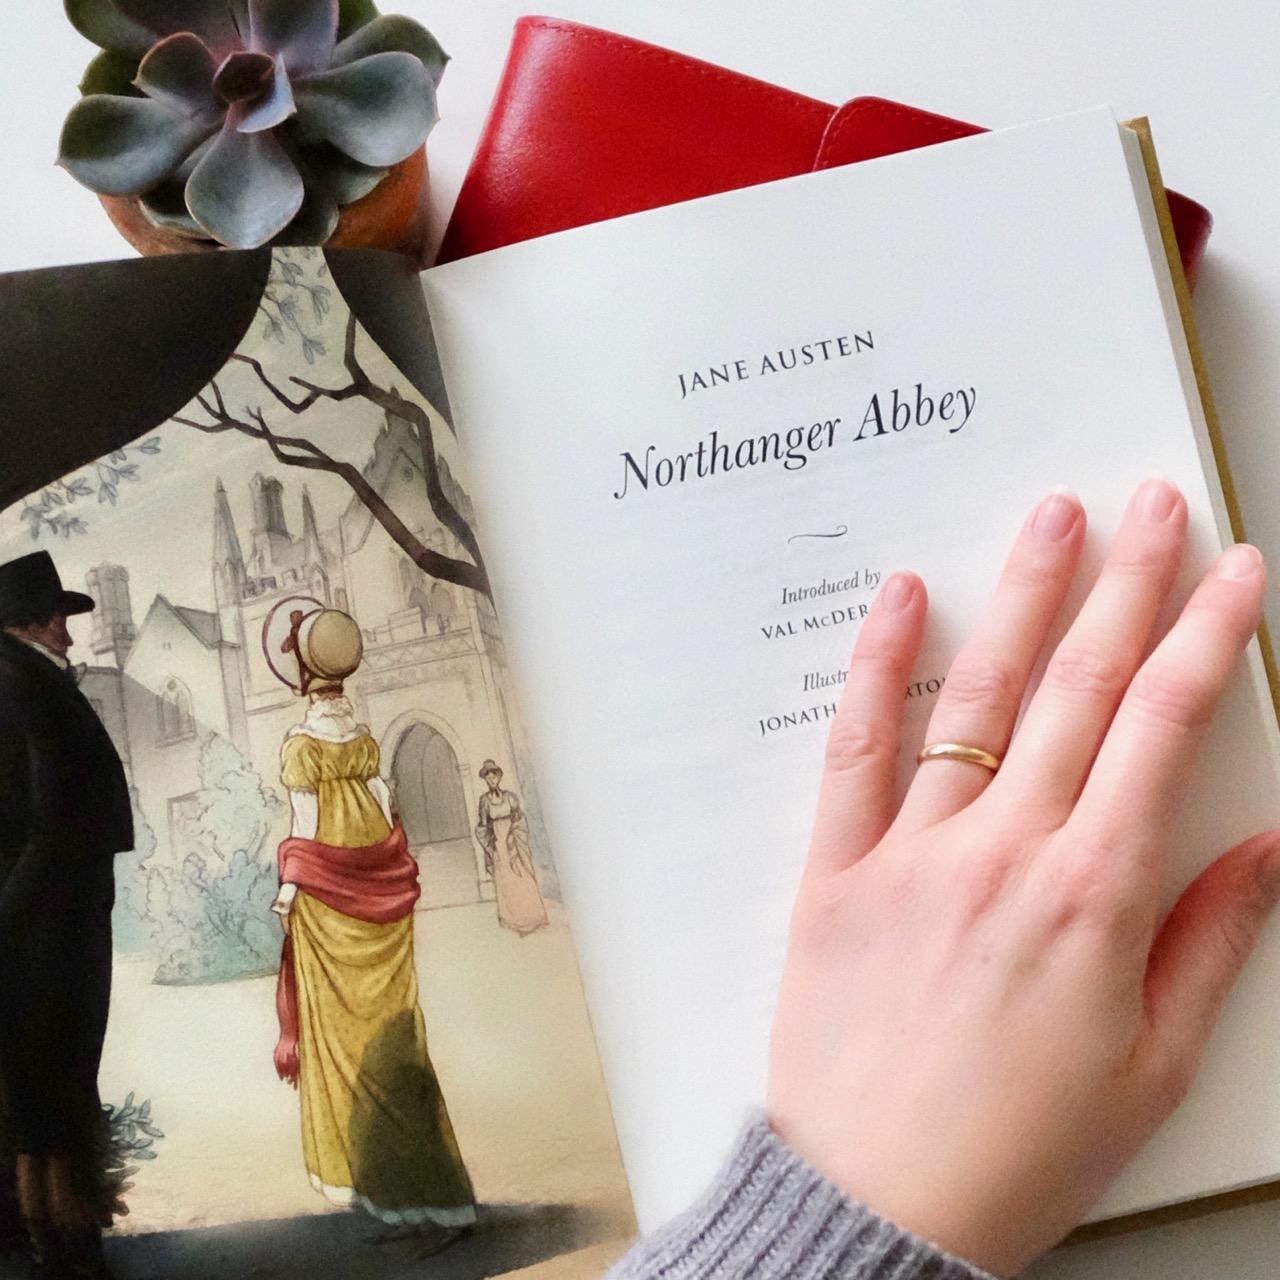 Northanger Abbey, Folio Society edition